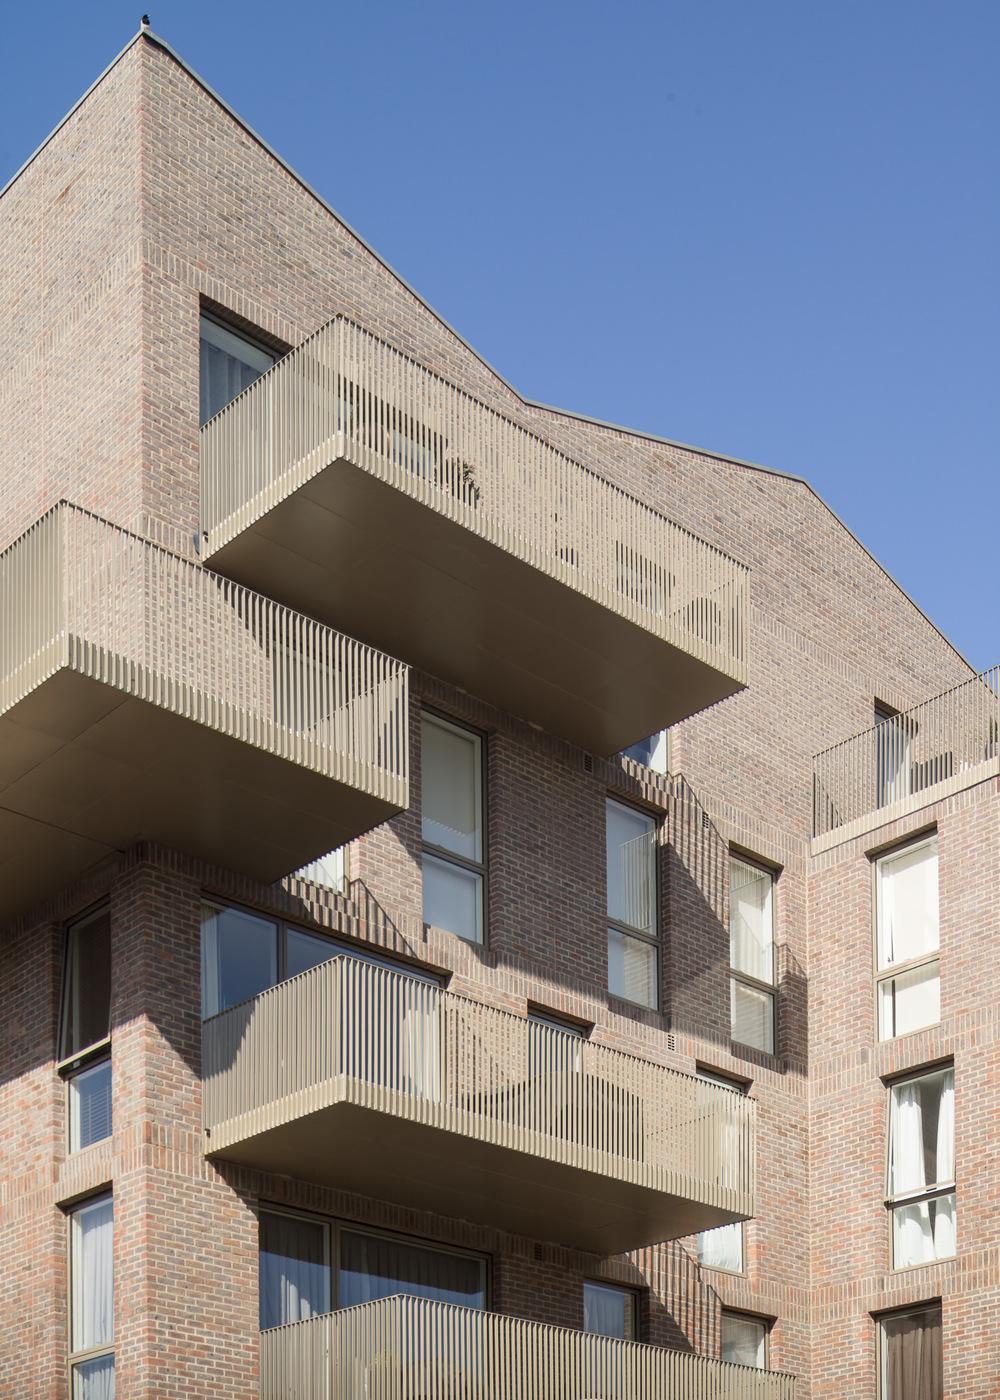 duggan-morris-brenrtford-lock-mark-hadden-amsterdam-architecture-photographer-architectuurfotograaf-028.jpg